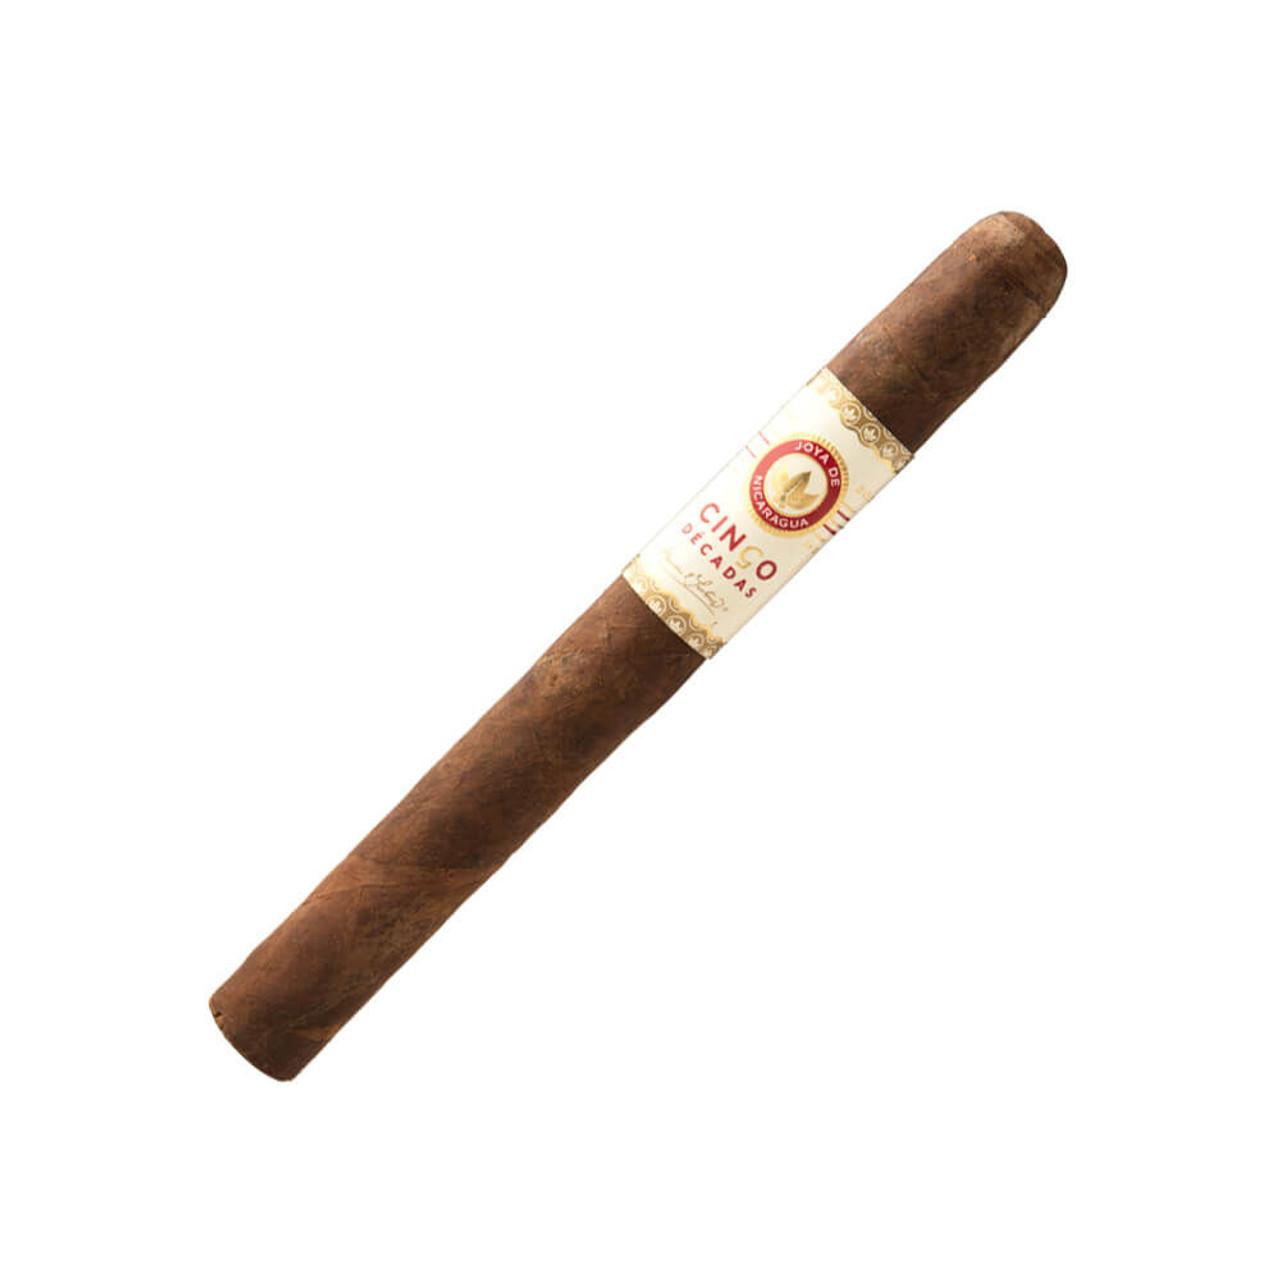 Joya de Nicaragua Cinco Decadas El General Cigars - 7 x 50 (Box of 10)